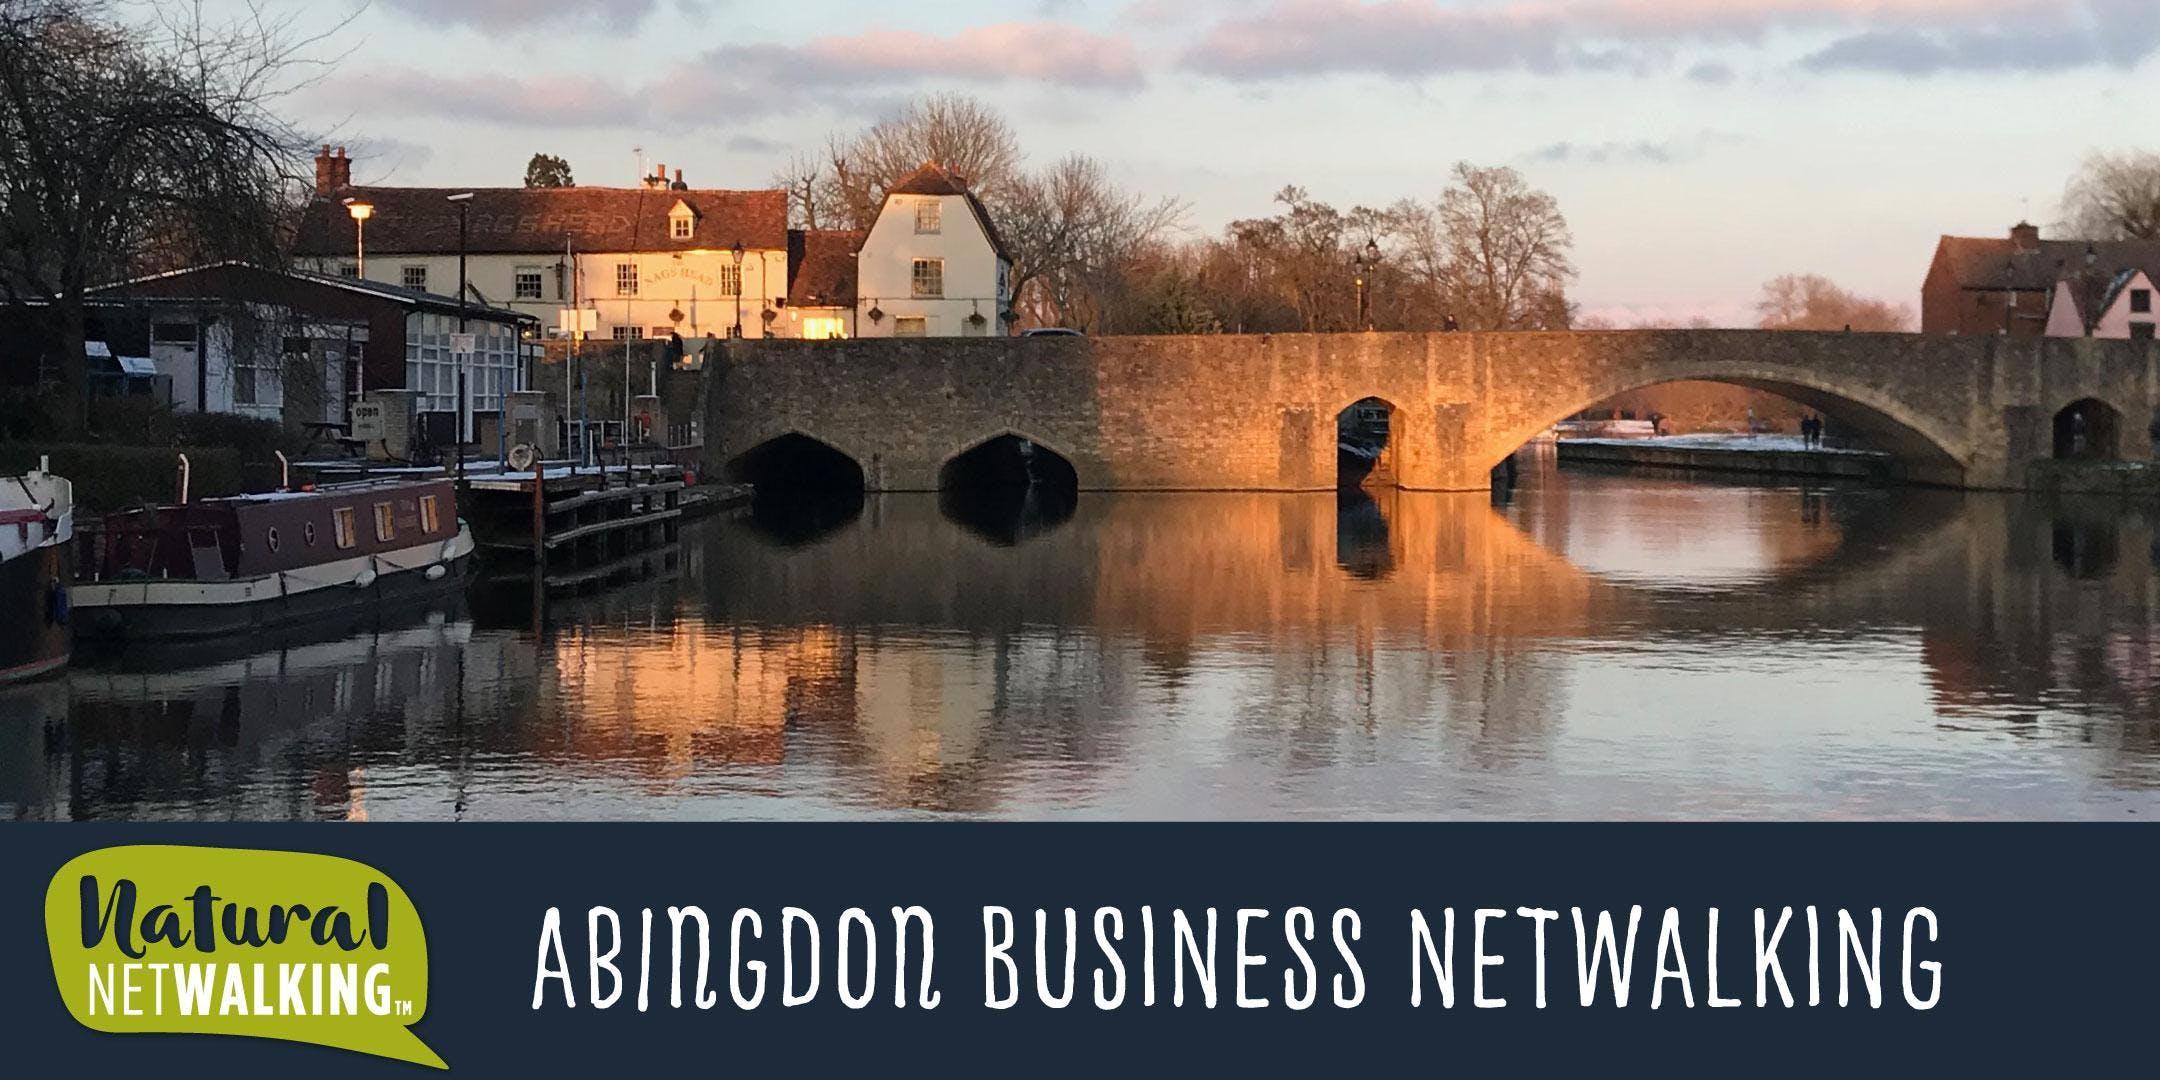 Netwalking in Abingdon Oxfordshire 22nd October 7.30am-9.30am